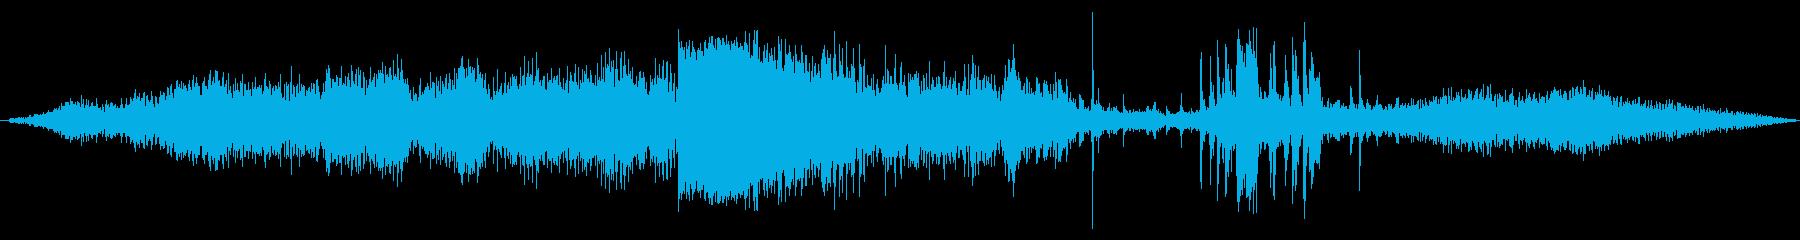 INT:逆回転、車への衝突の再生済みの波形